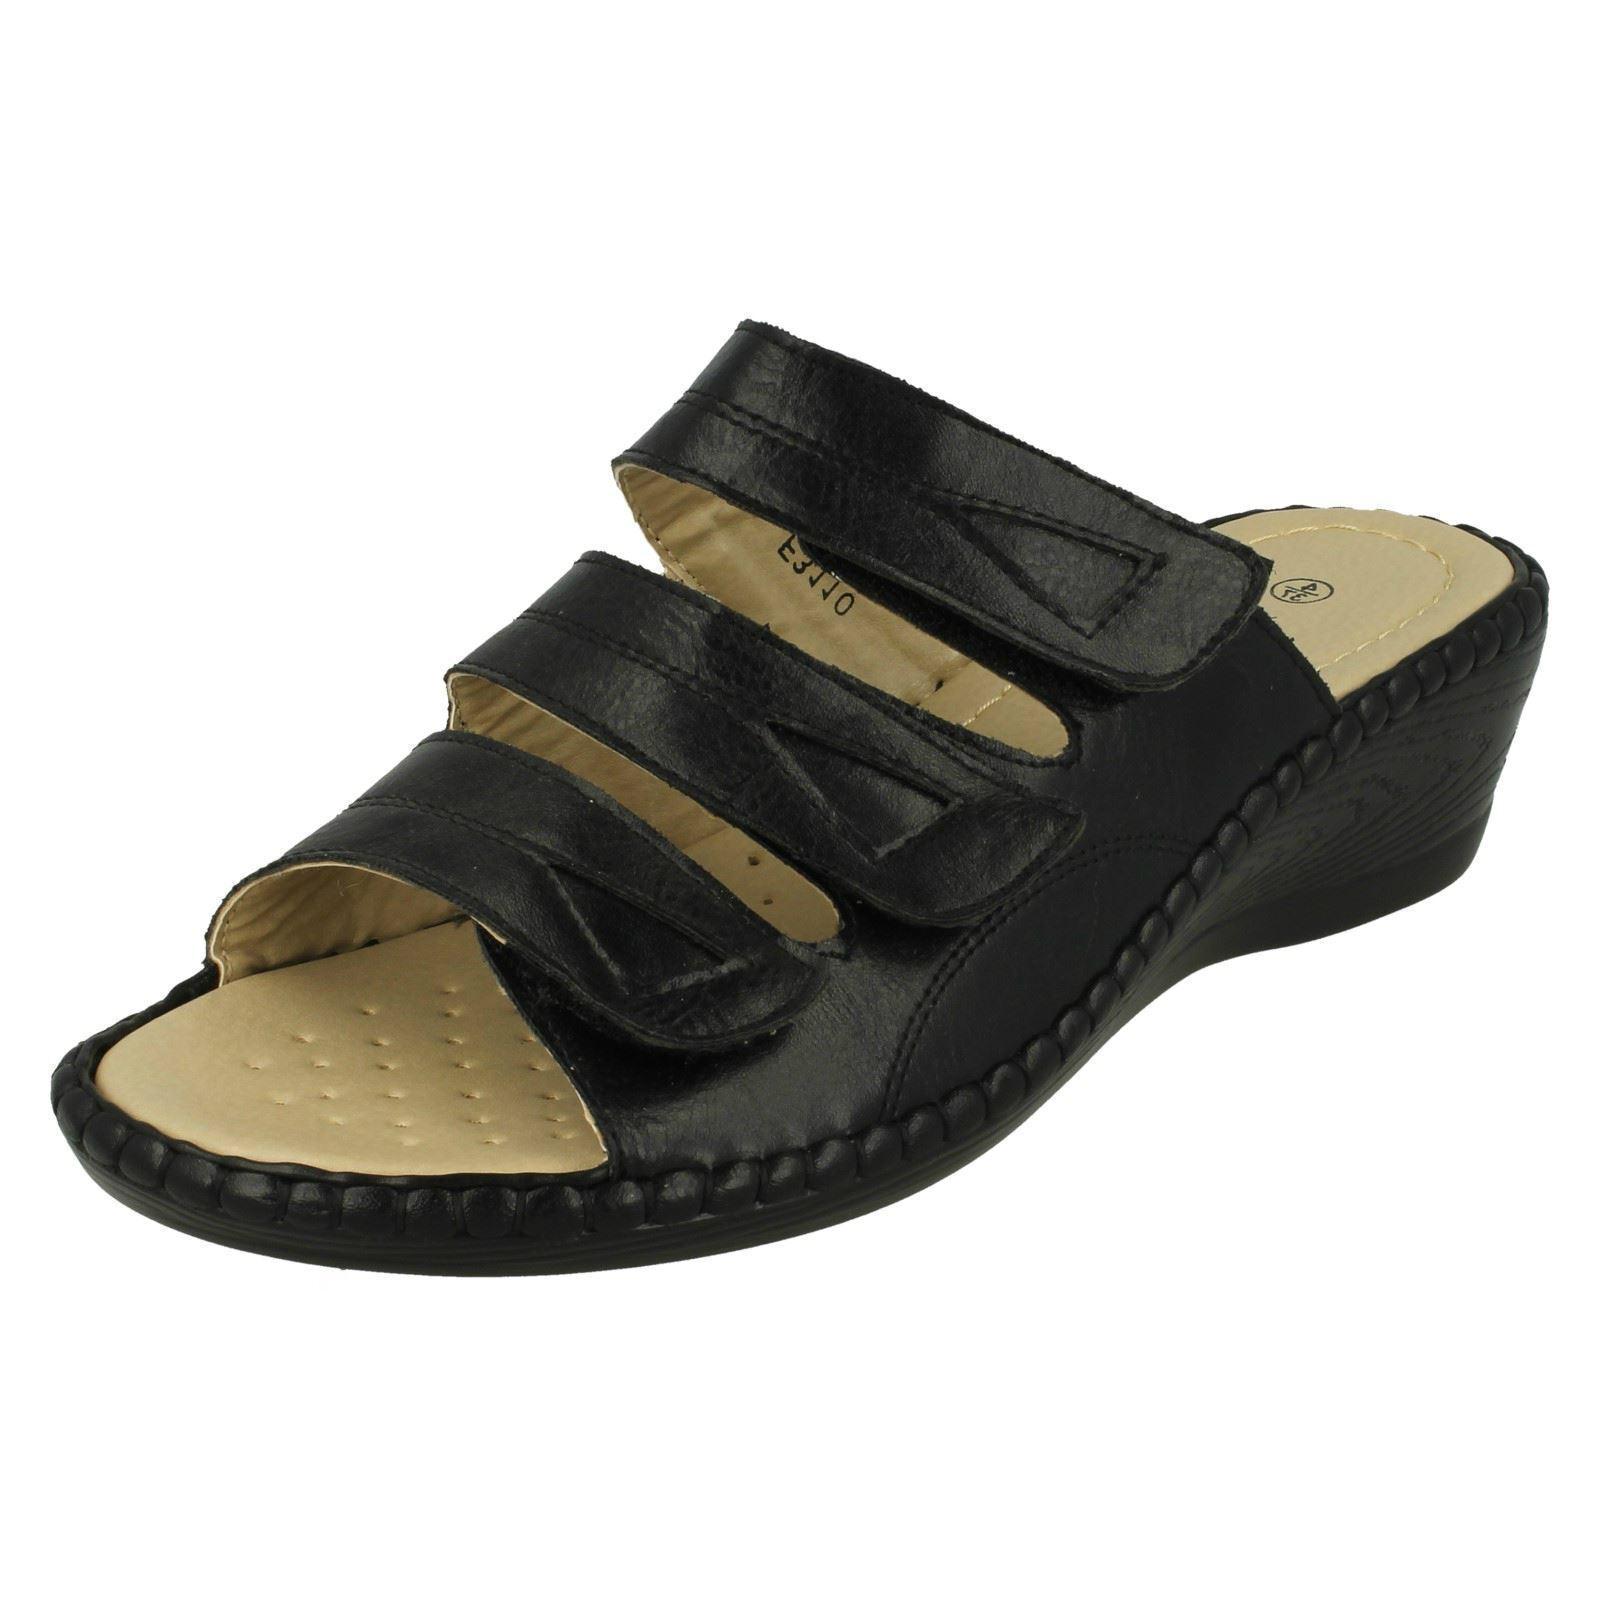 Mujer Eaze f3r110 Negro Zapatos Sin Talón f3r110 Eaze 066c00